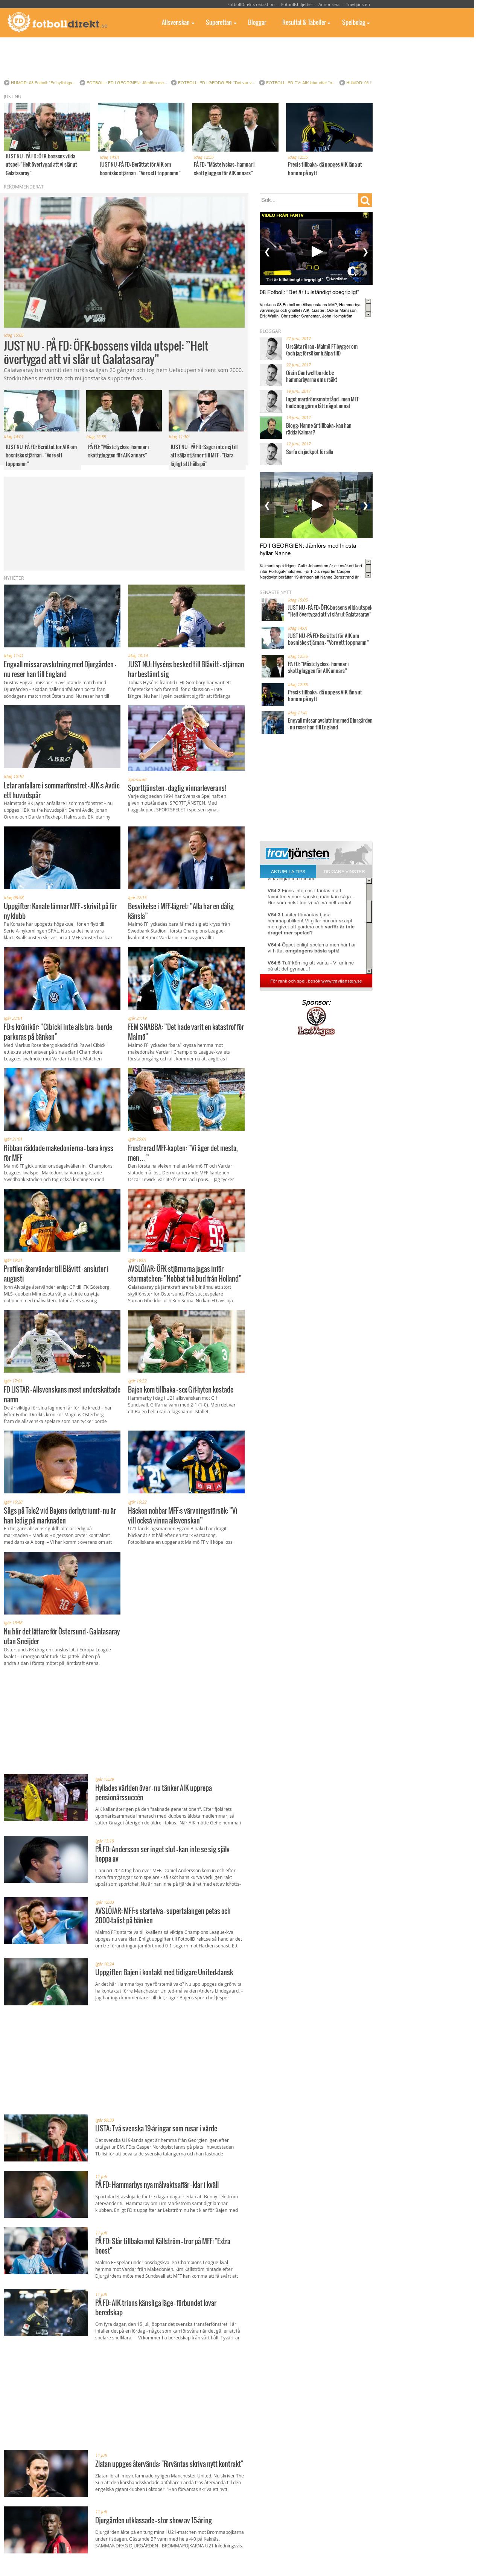 Fotbolldirekt online dating